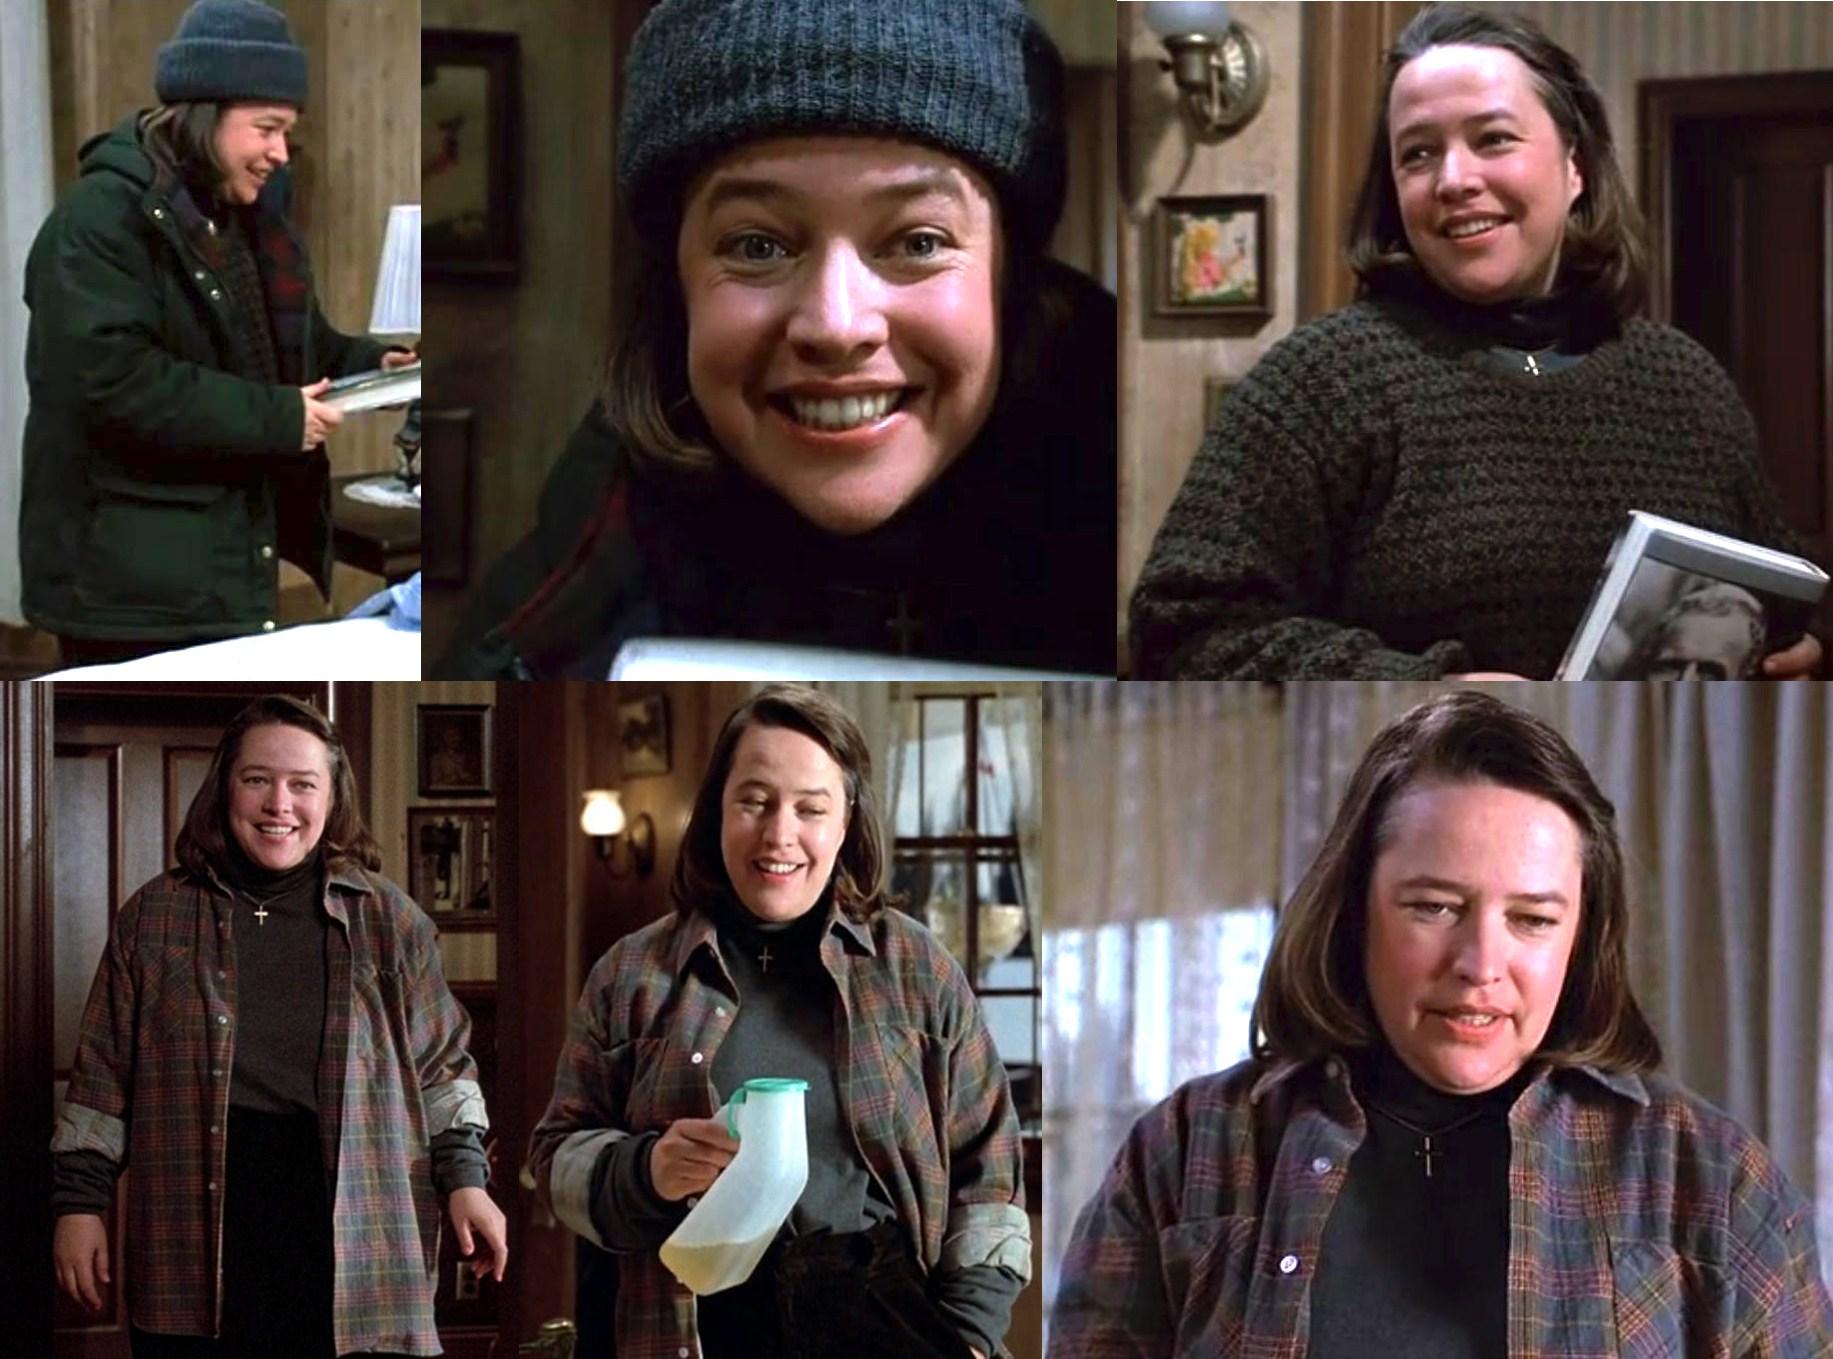 Kathy Bates en Misery (1990) de Rob Reiner